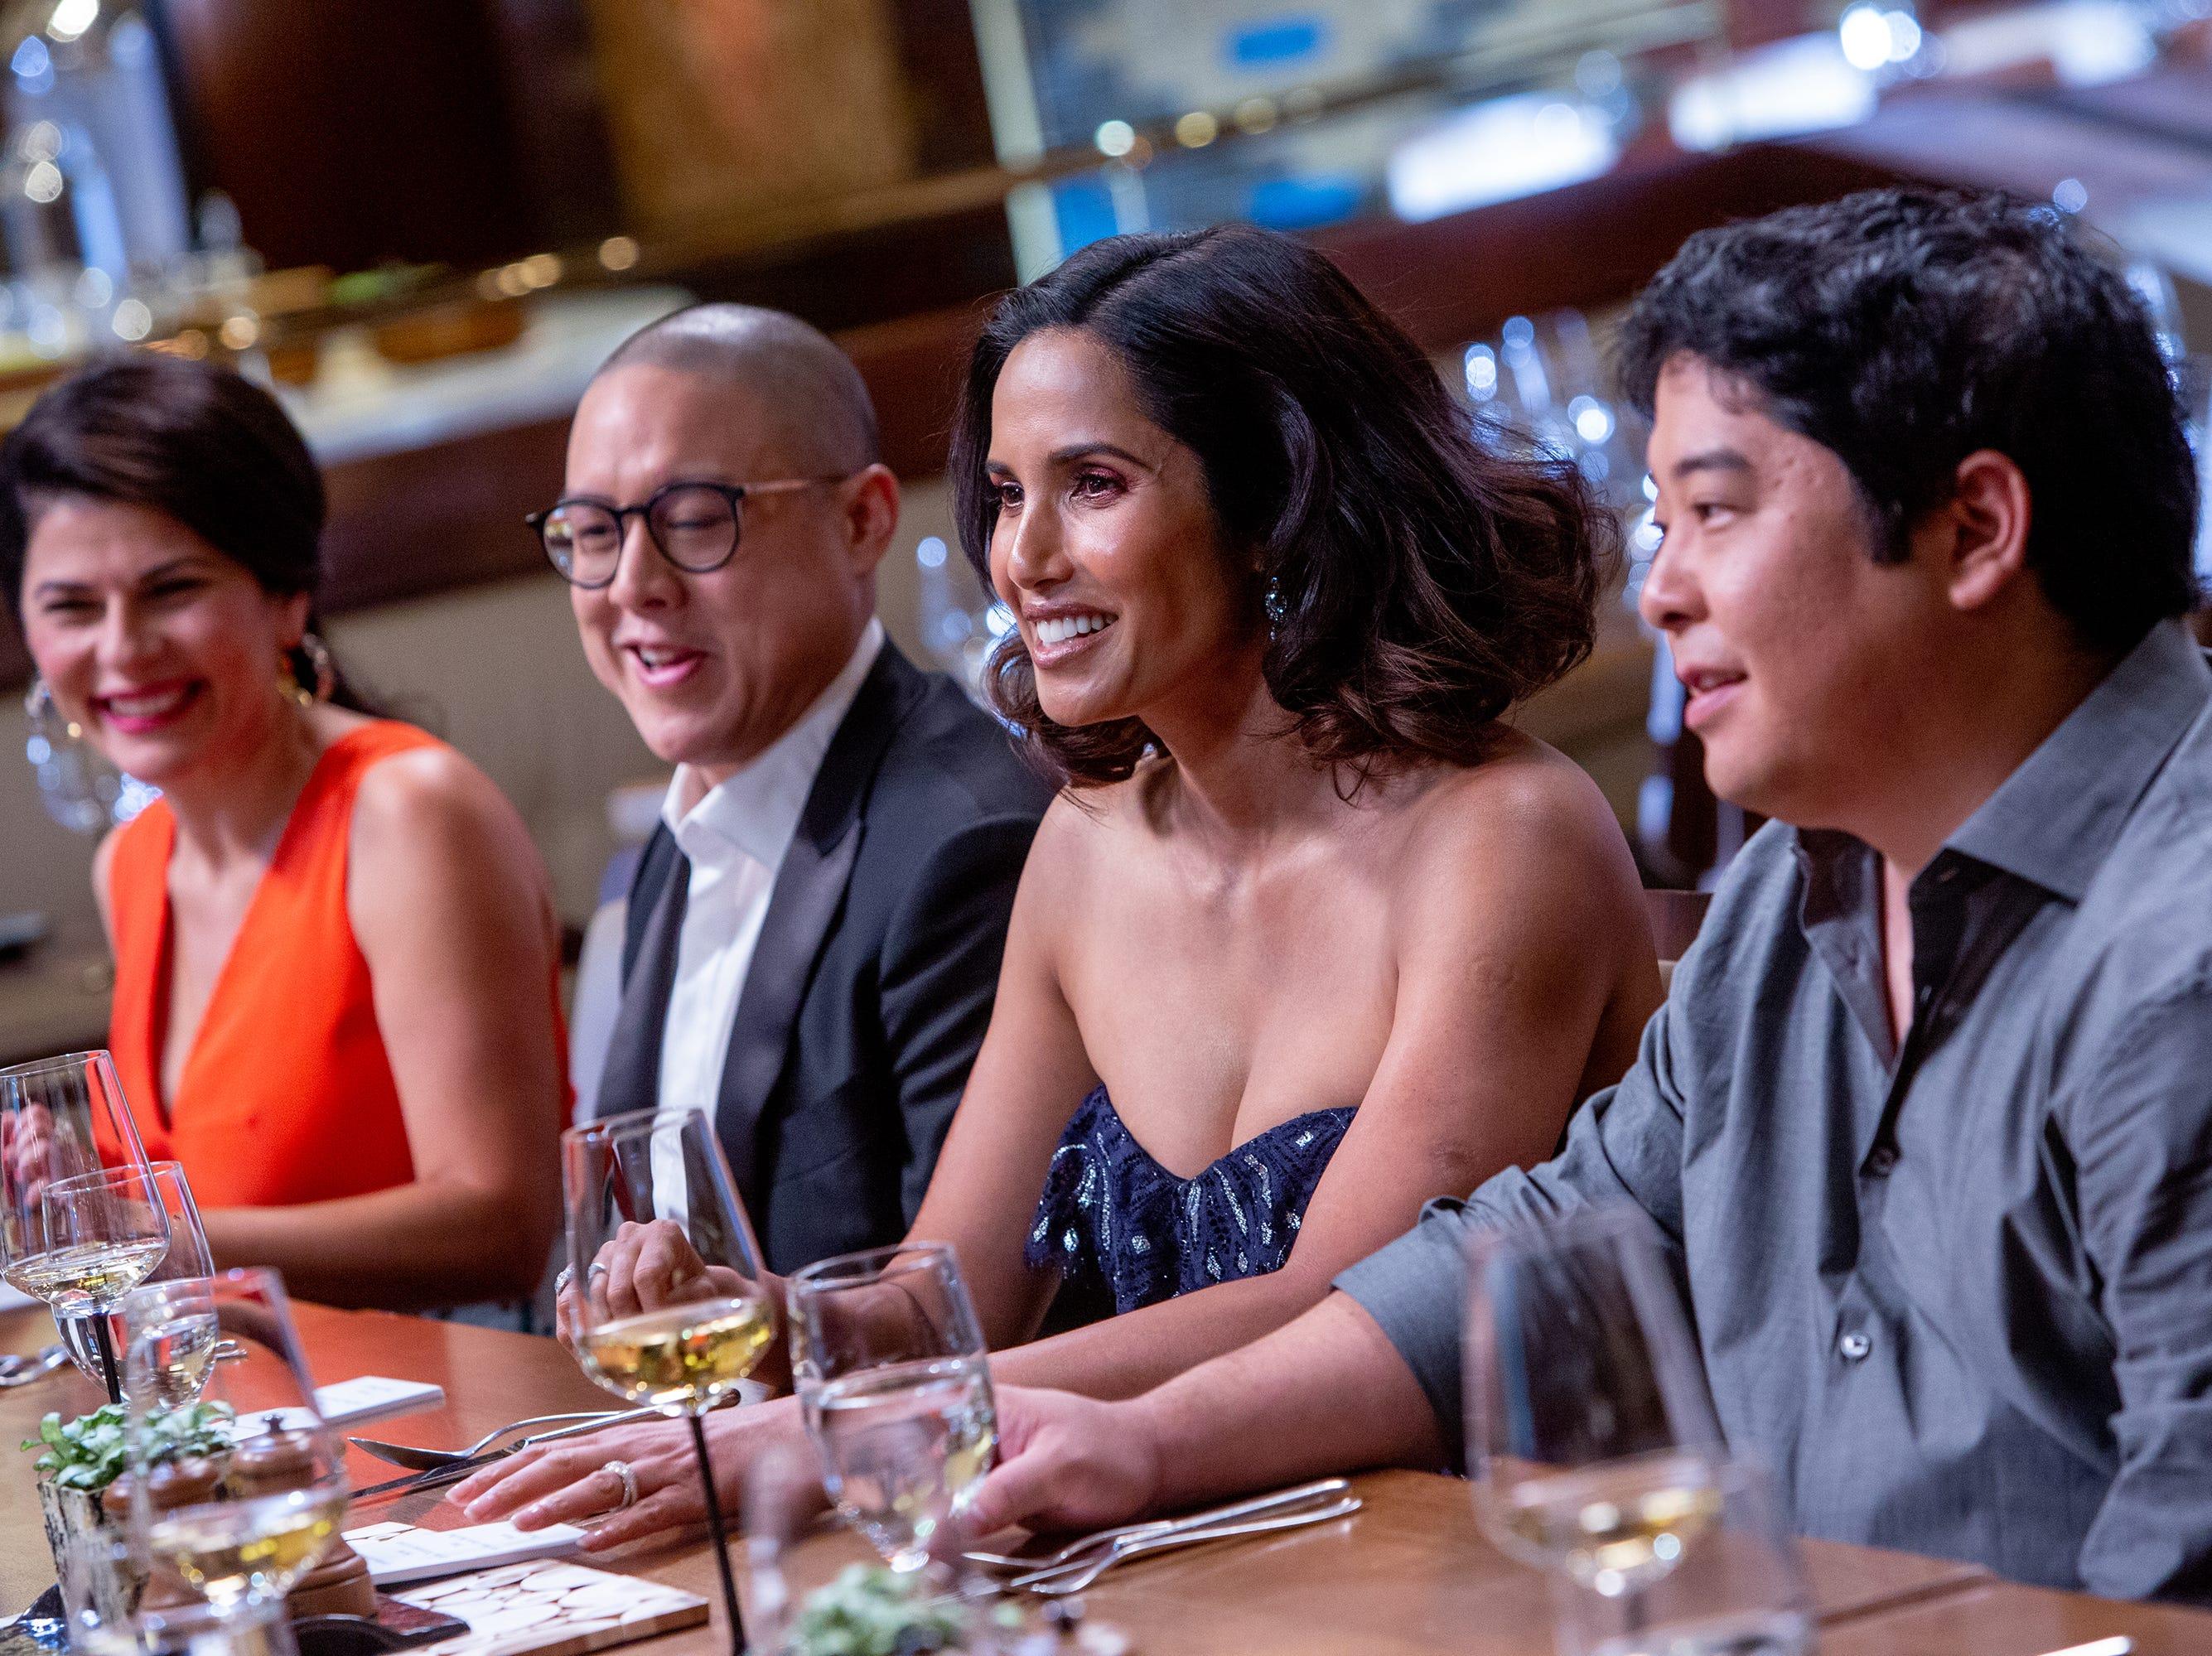 (Left to right) Nilou Motamed, Dan Hong, Padma Lakshmi and Mitsuharu Tsumura dine in episode 15 of 'Top Chef' Kentucky.